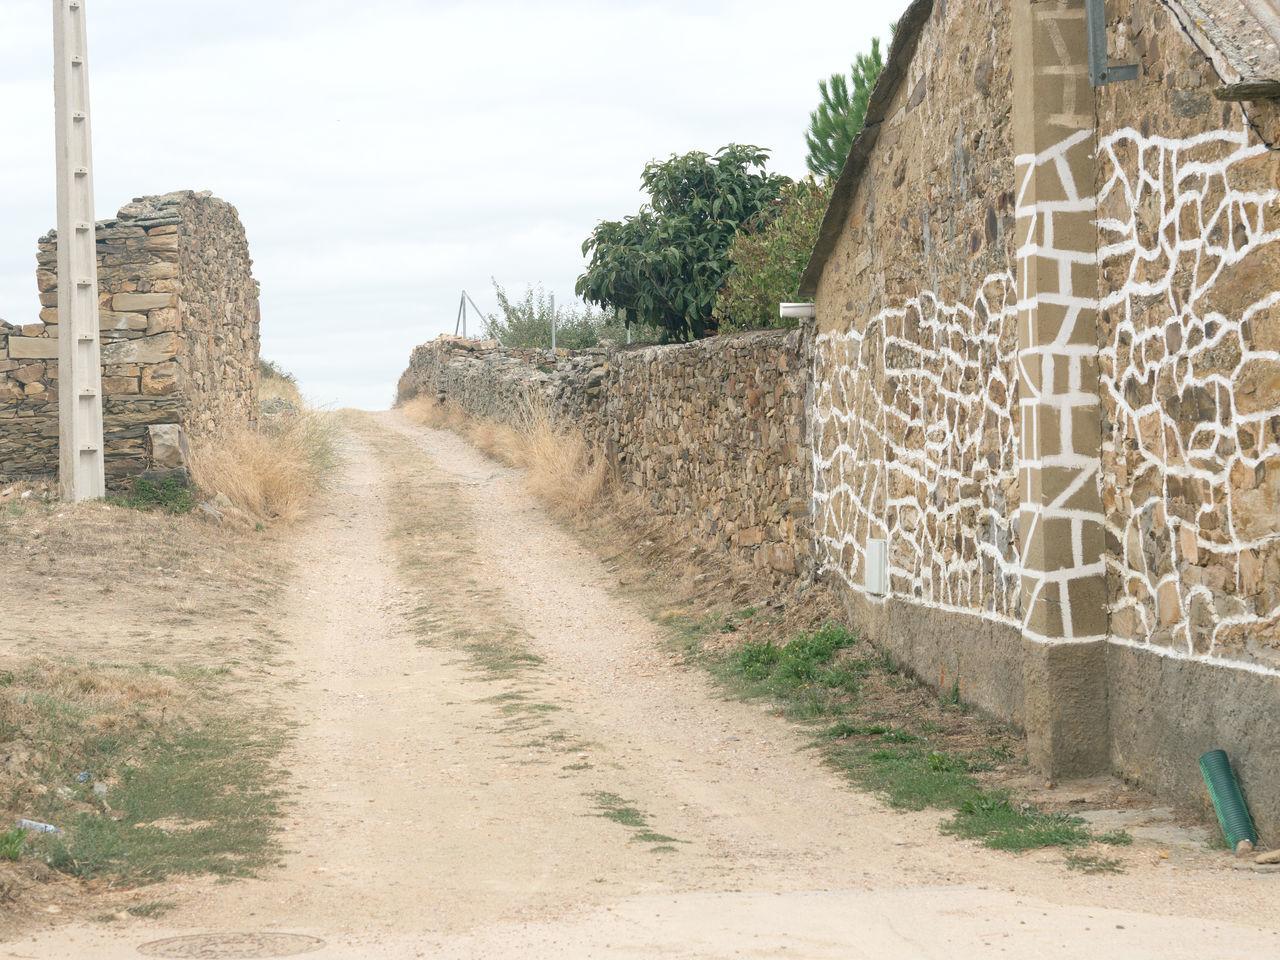 Camino De Santiago / Way Of Saint James in Astorga, Spain Arid Climate Camino De Santiago Footpath Pathway Pilgrimage Travel Destinations Walkway Way Way Of Saint James